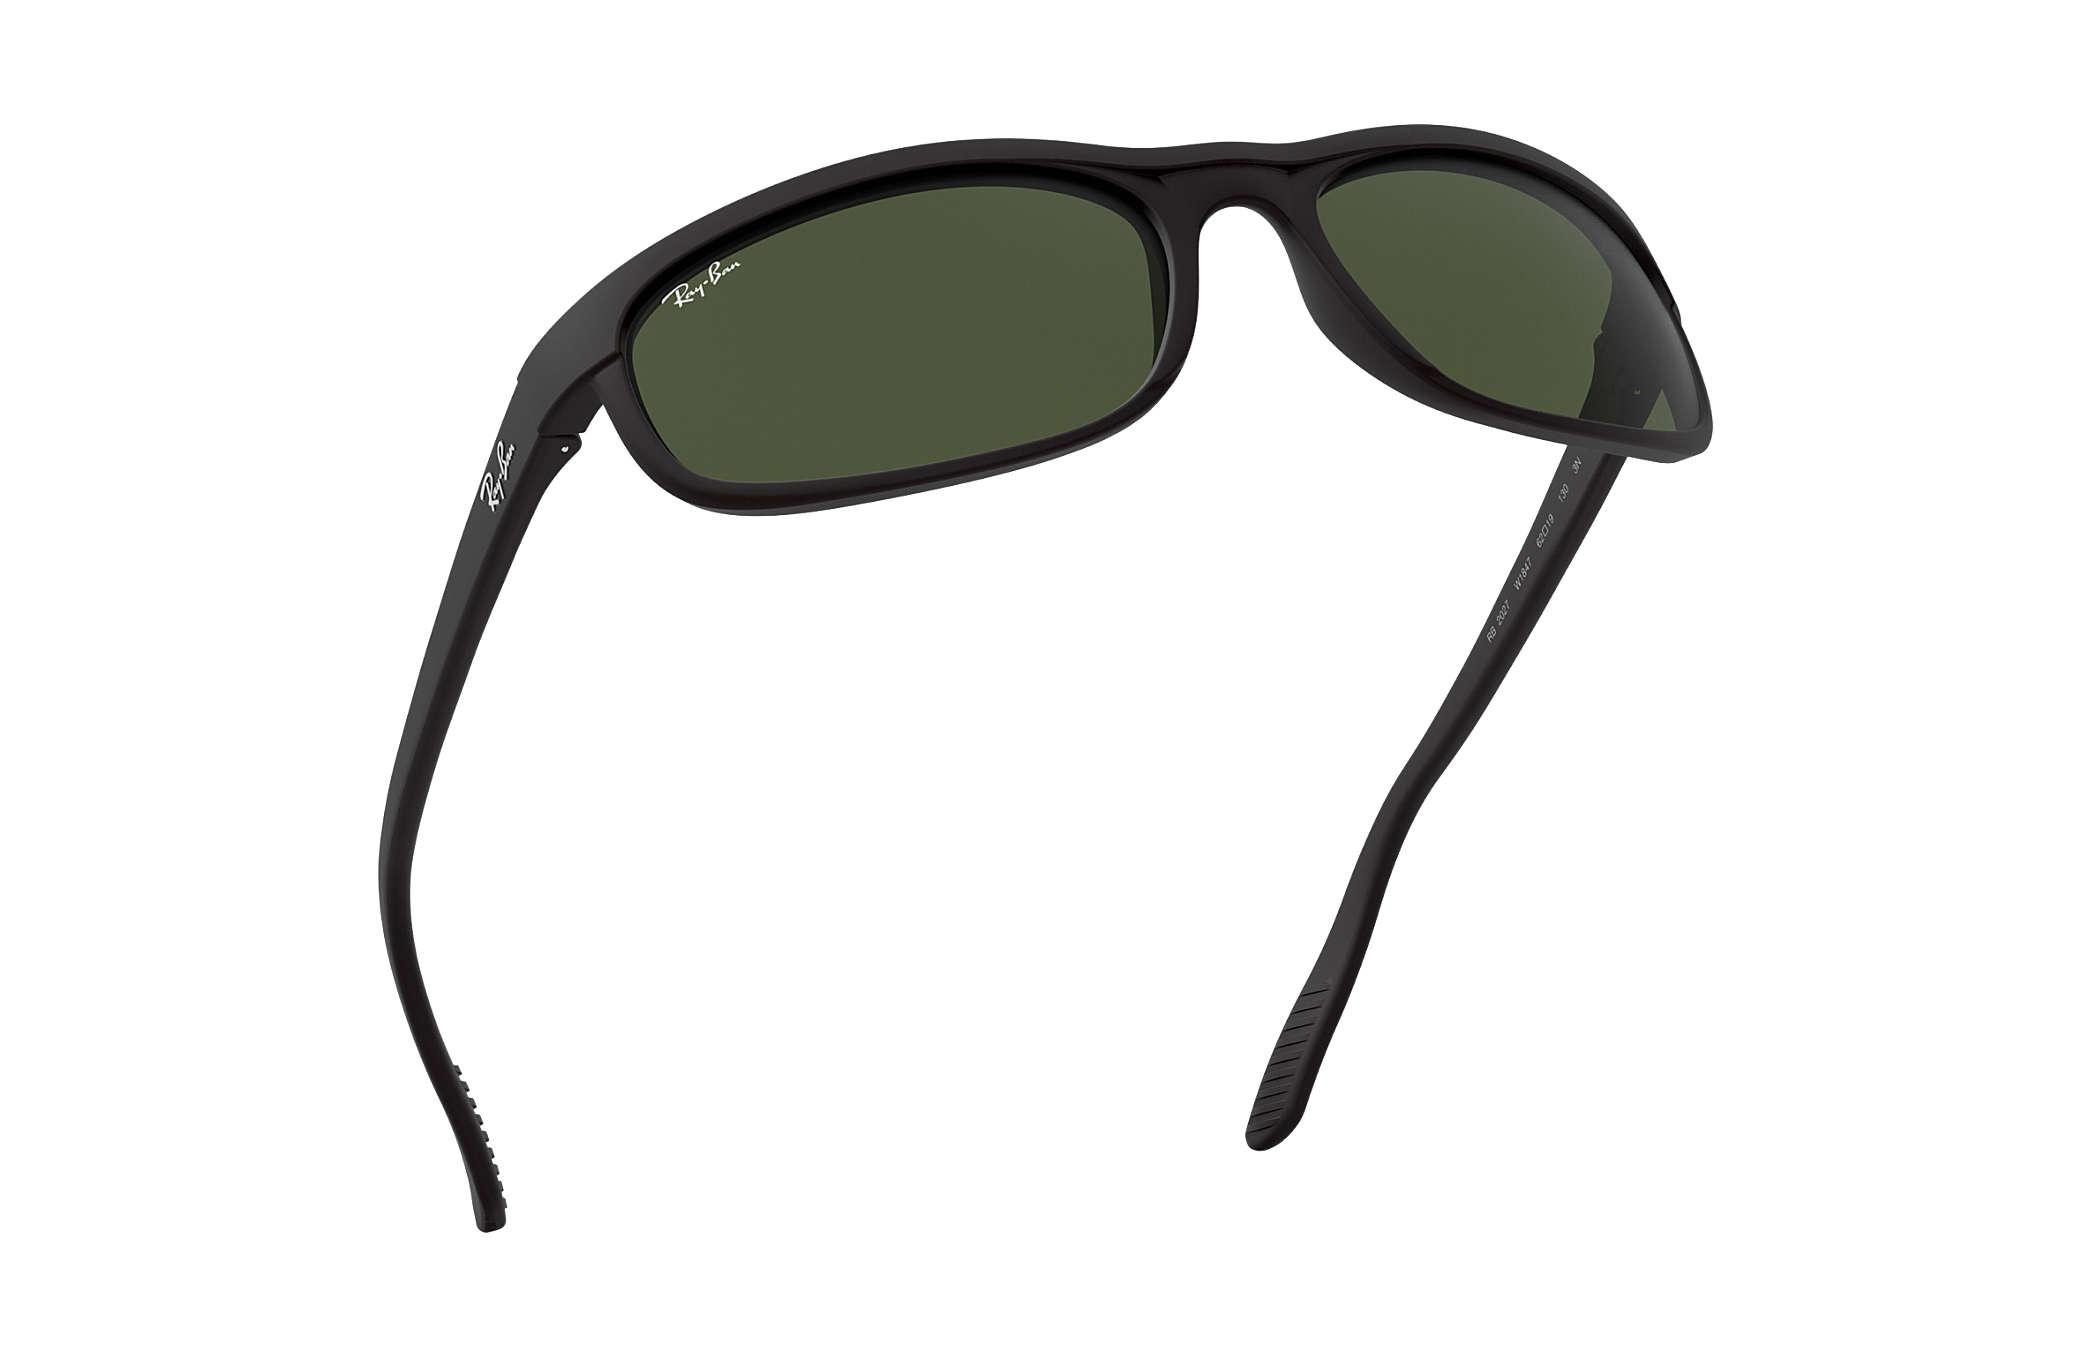 8a3255abaa46 Ray-Ban Predator 2 RB2027 Black - Nylon - Green Lenses ...